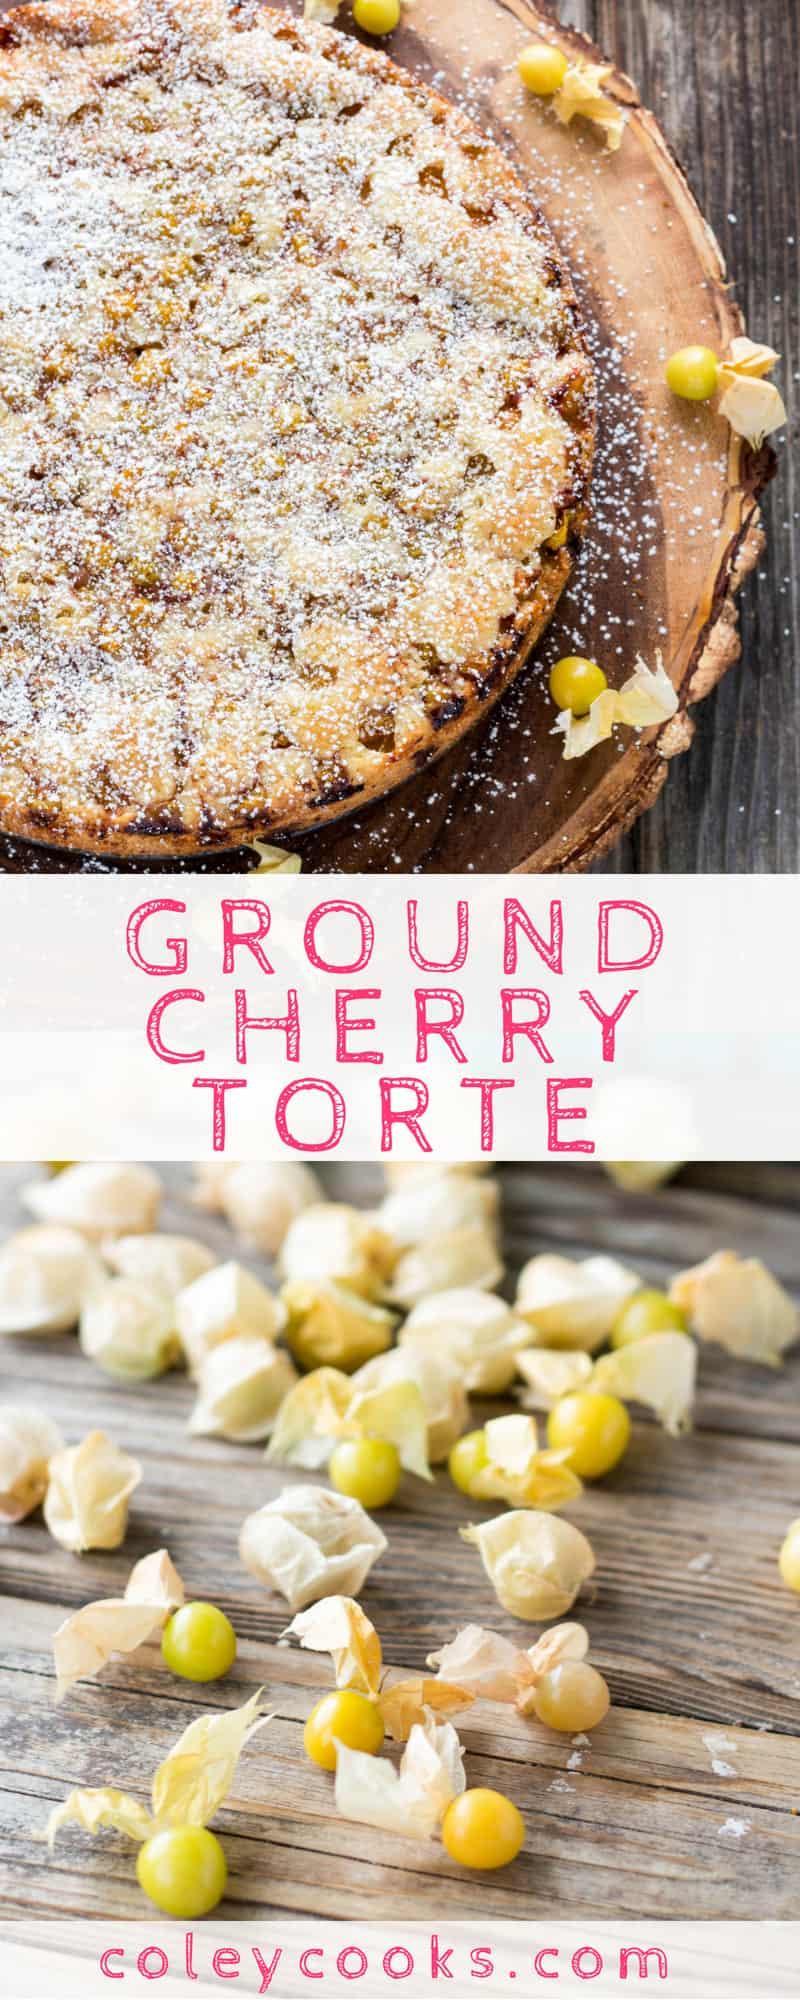 Ground Cherry Torte Coley Cooks